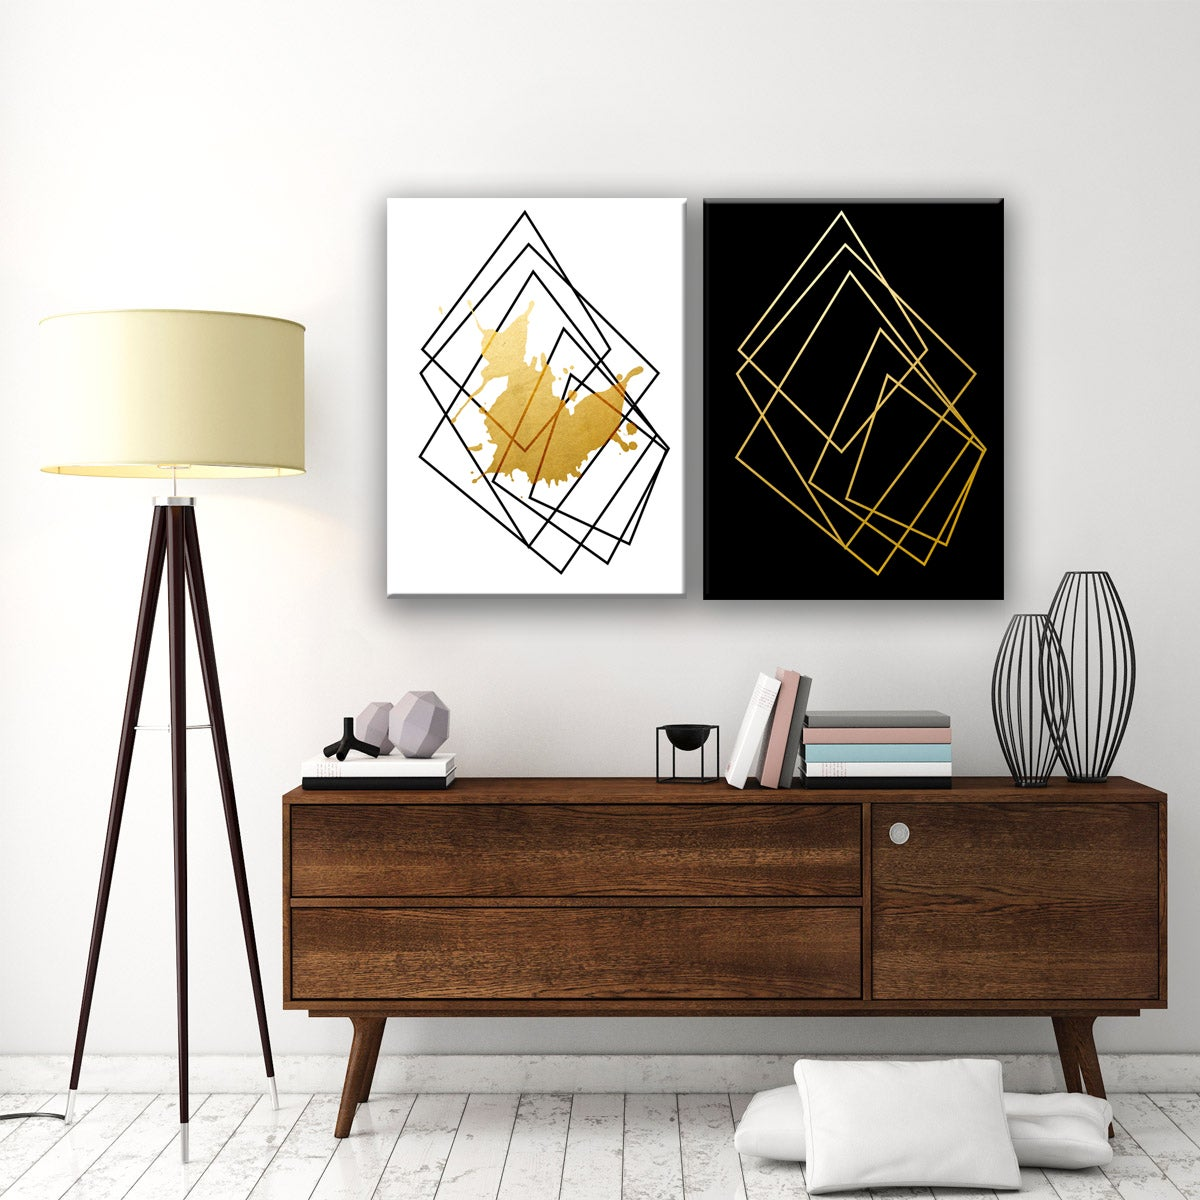 Vertical Art Gallery | Shop our Best Home Goods Deals Online at ...